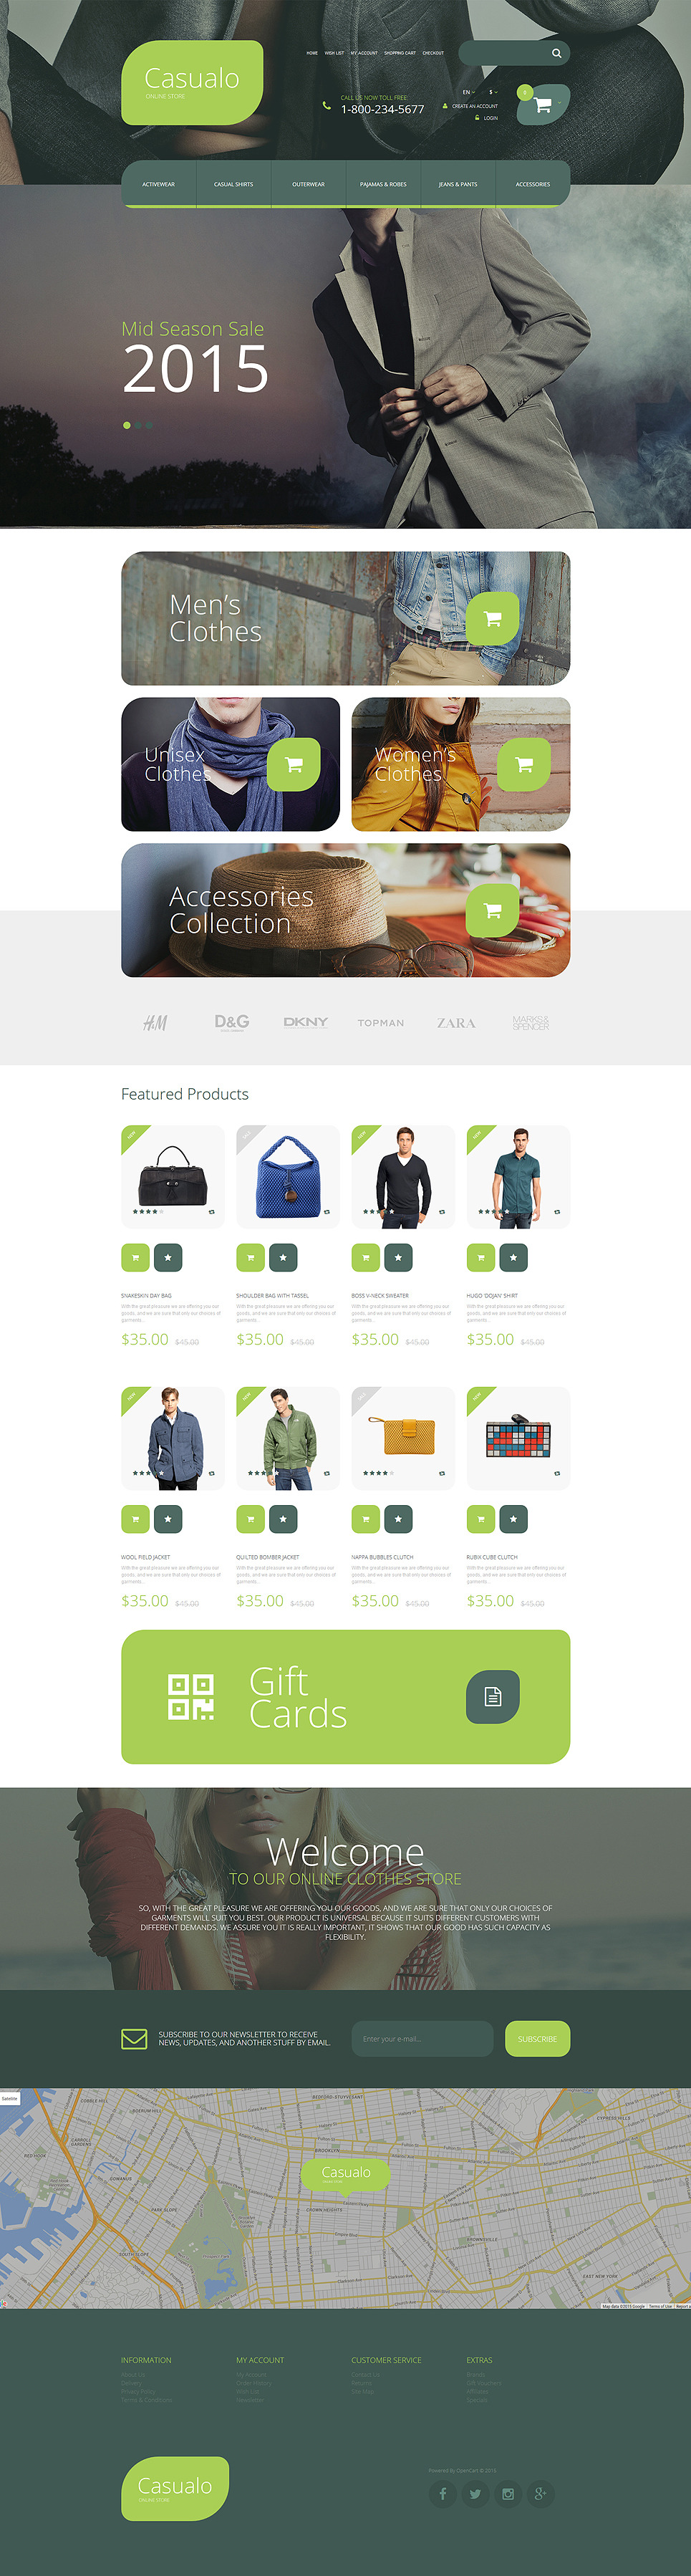 Casualo OpenCart Template New Screenshots BIG